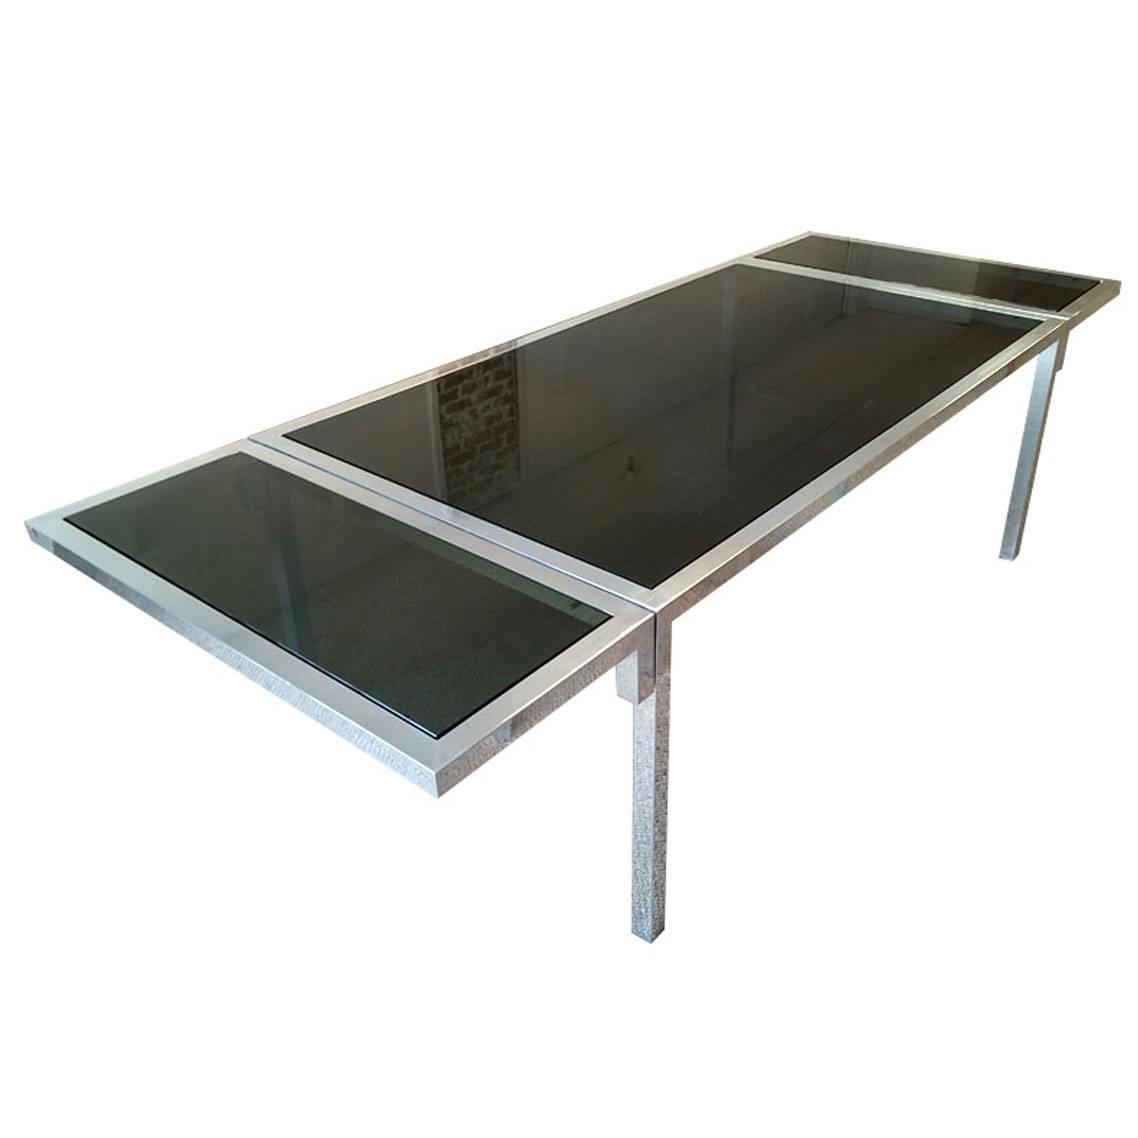 Mid Century Modern Aluminium And Smoked Glass Dining Table, Circa 1970s